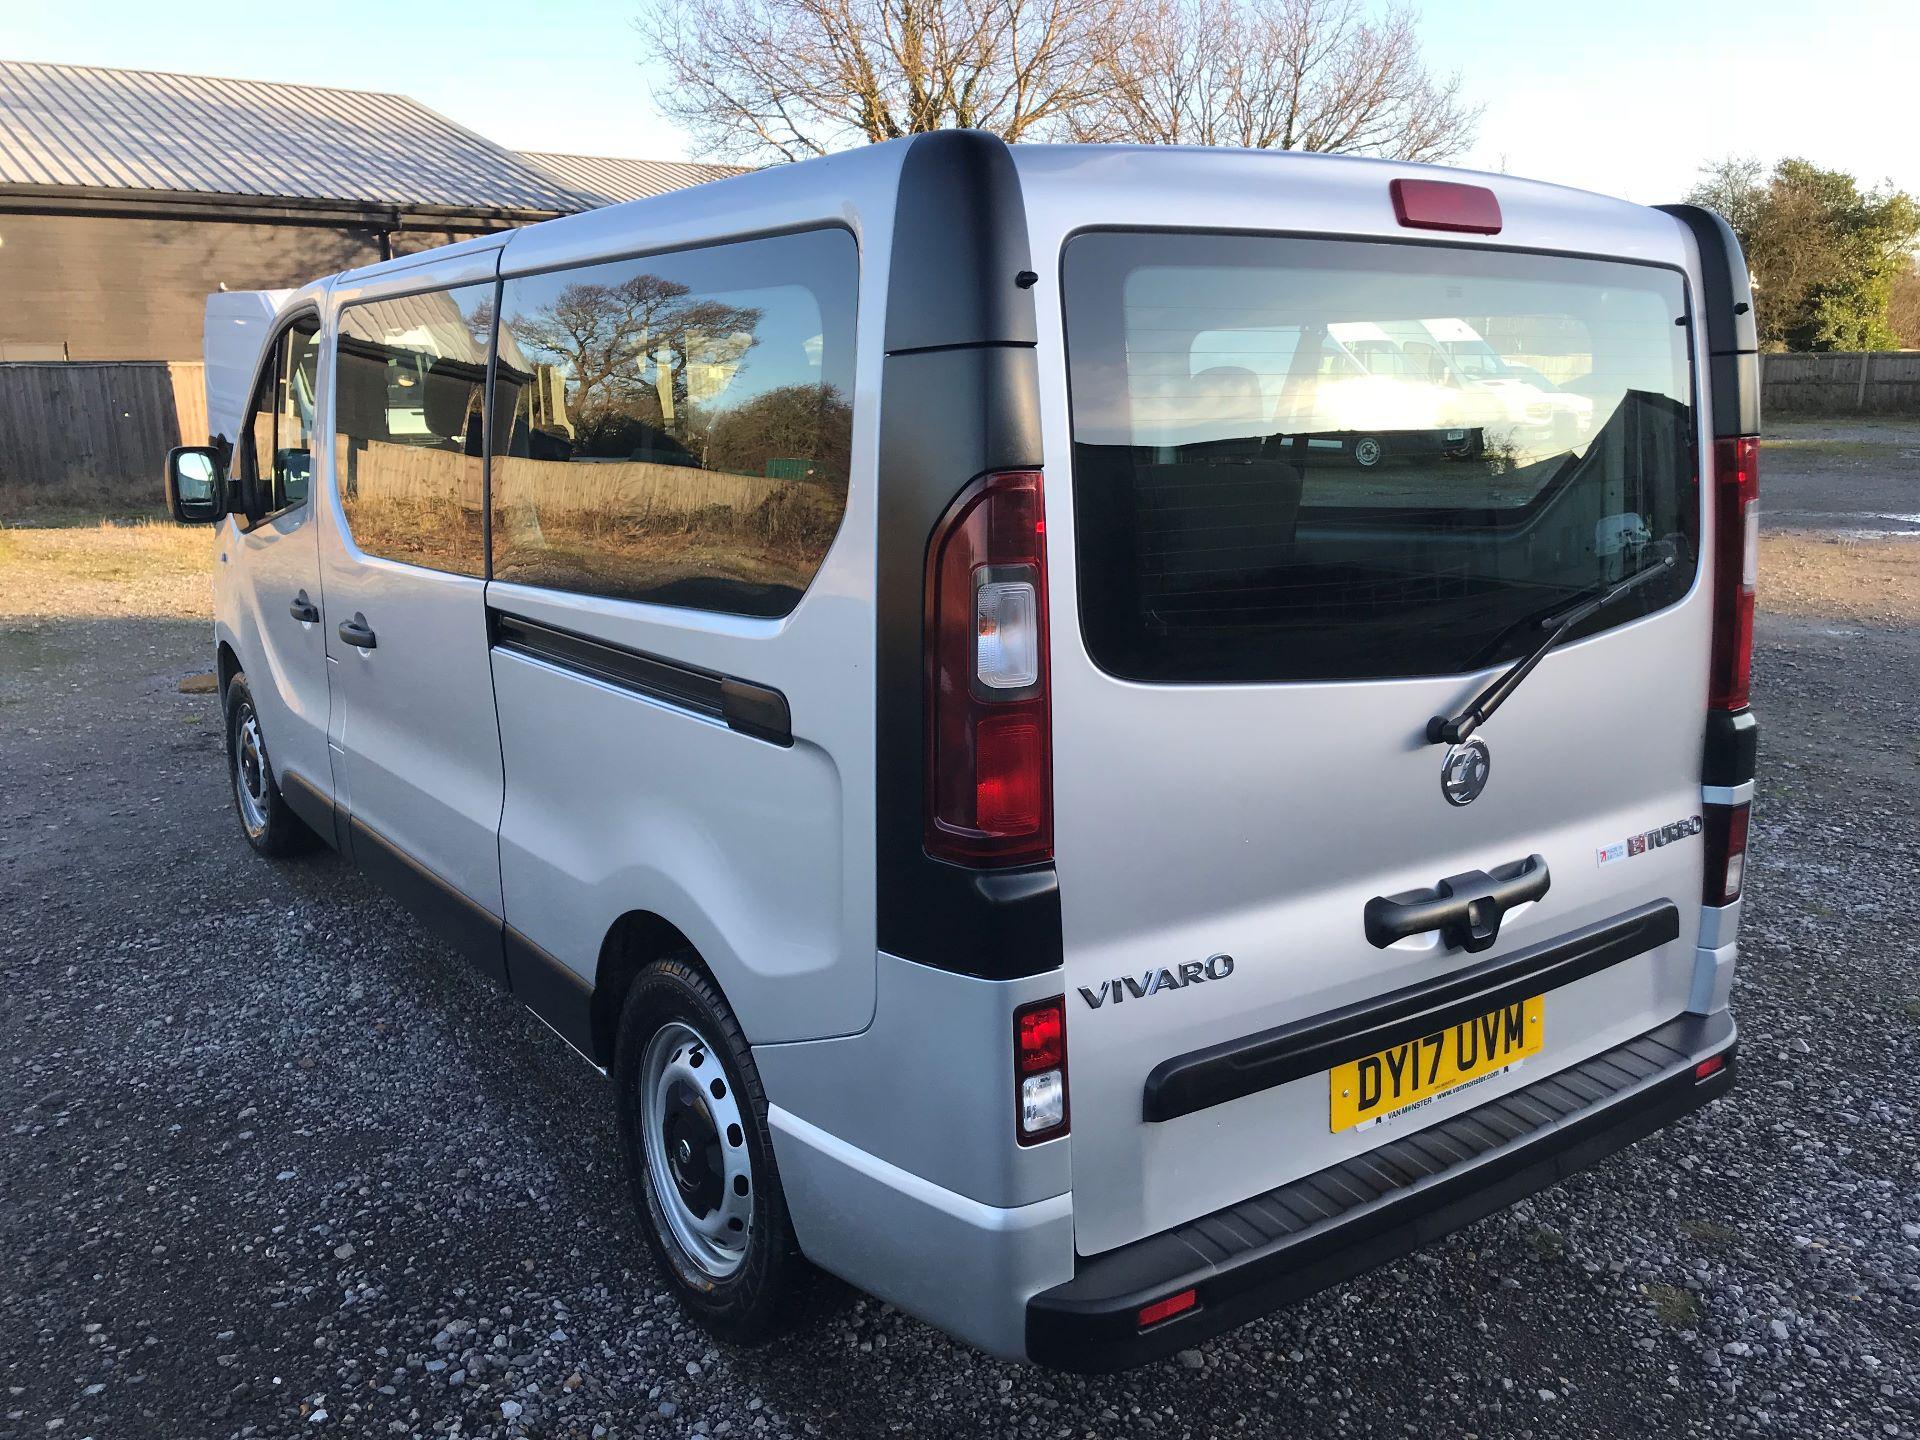 2017 Vauxhall Vivaro 2900 1.6Cdti Biturbo 125Ps H1 Combi 9 Seat (DY17UVM) Image 6